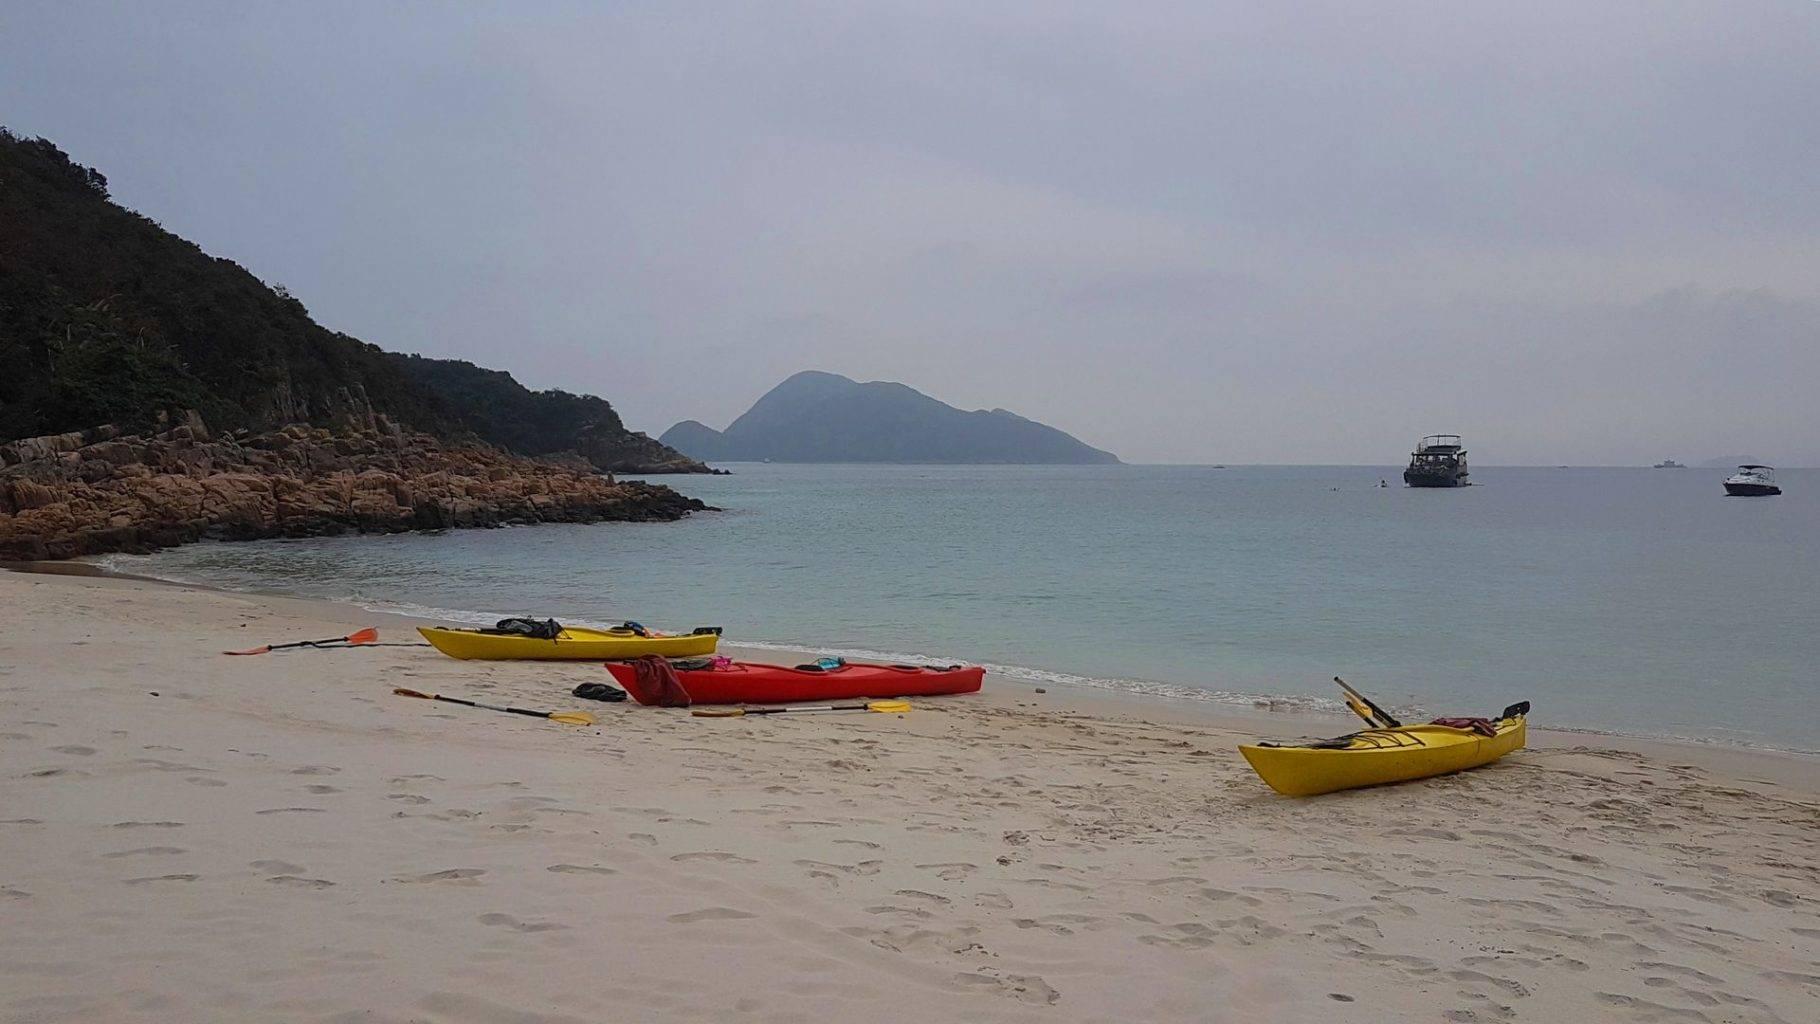 02 Mar 2019 UNESCO 2 day sea kayak trip Hong Kong 14